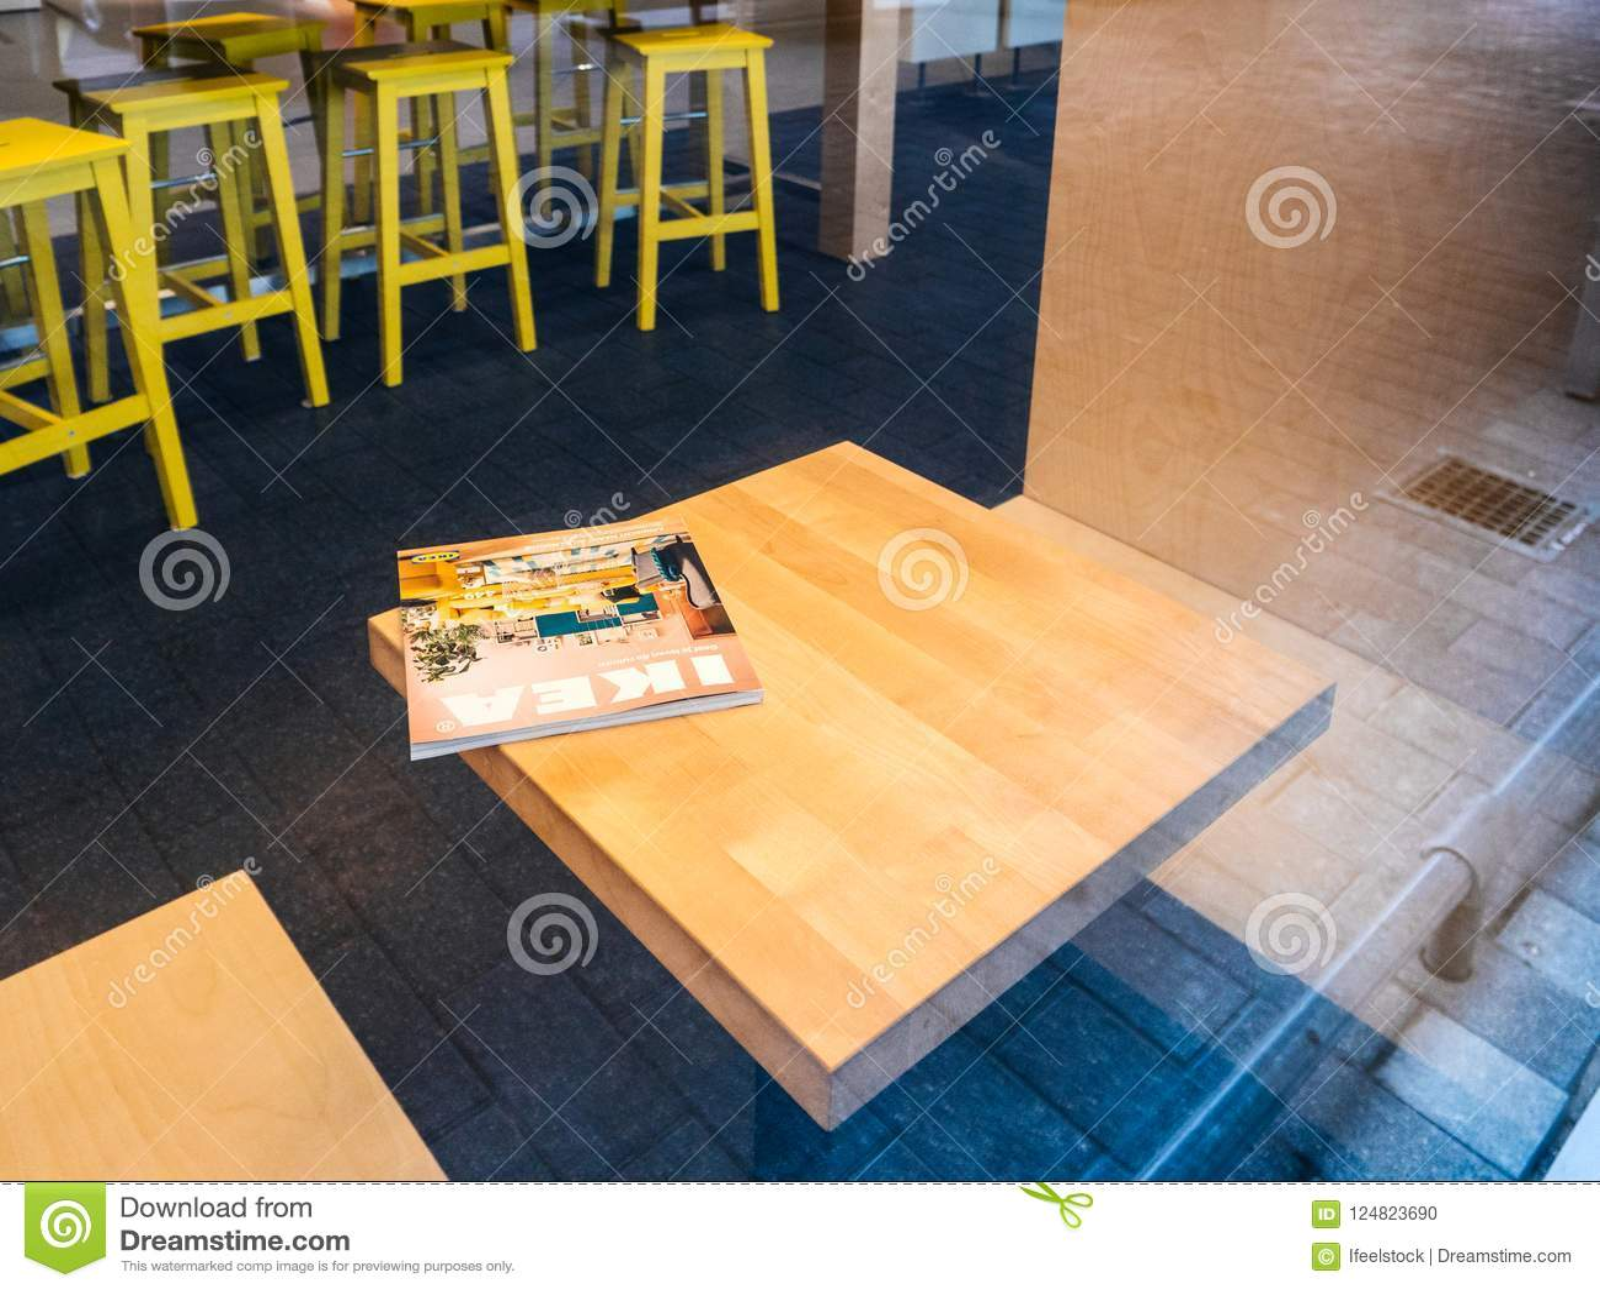 Ikea Catalogue On Cafe Table Inside Furniture Supermarket Editorial